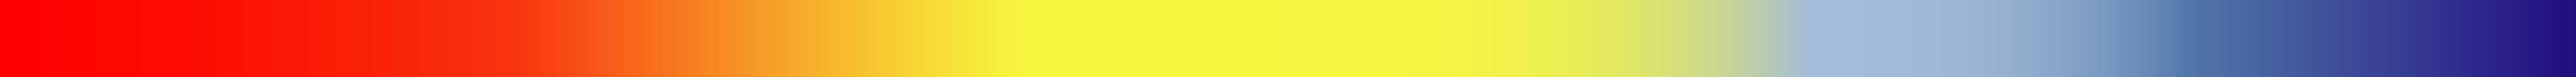 rhotens gradient blank2